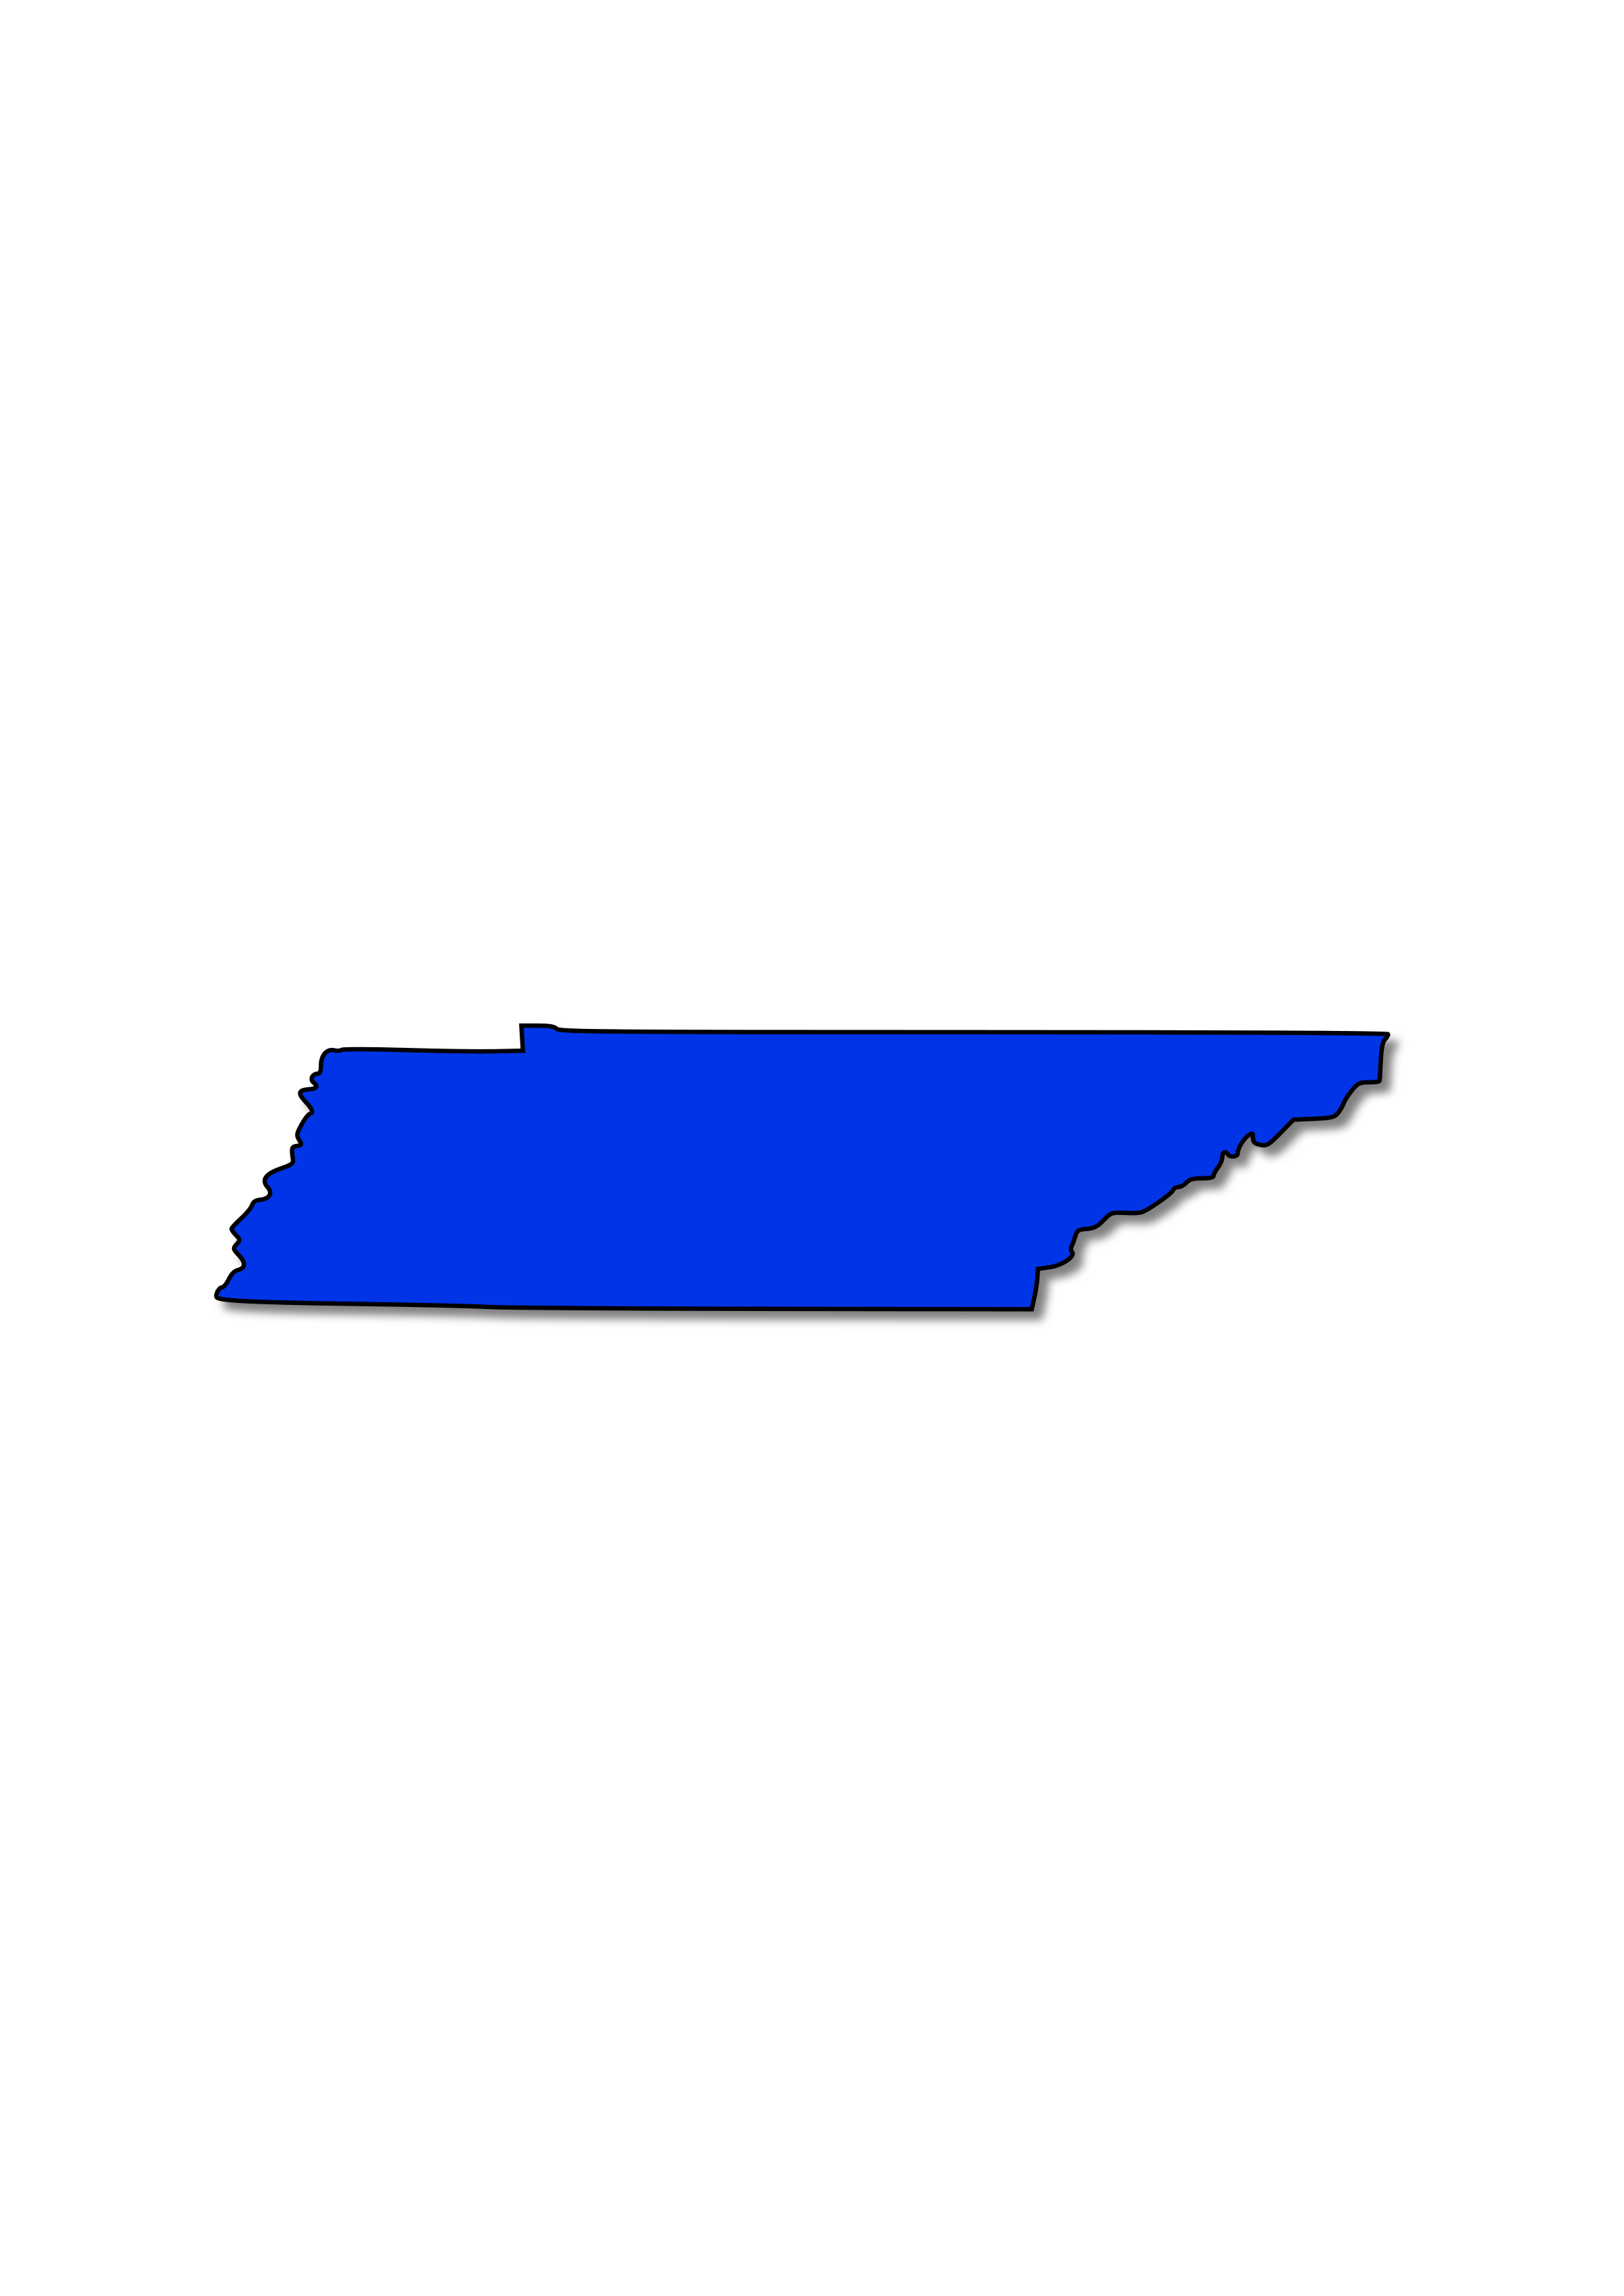 Tennessee Clip art.